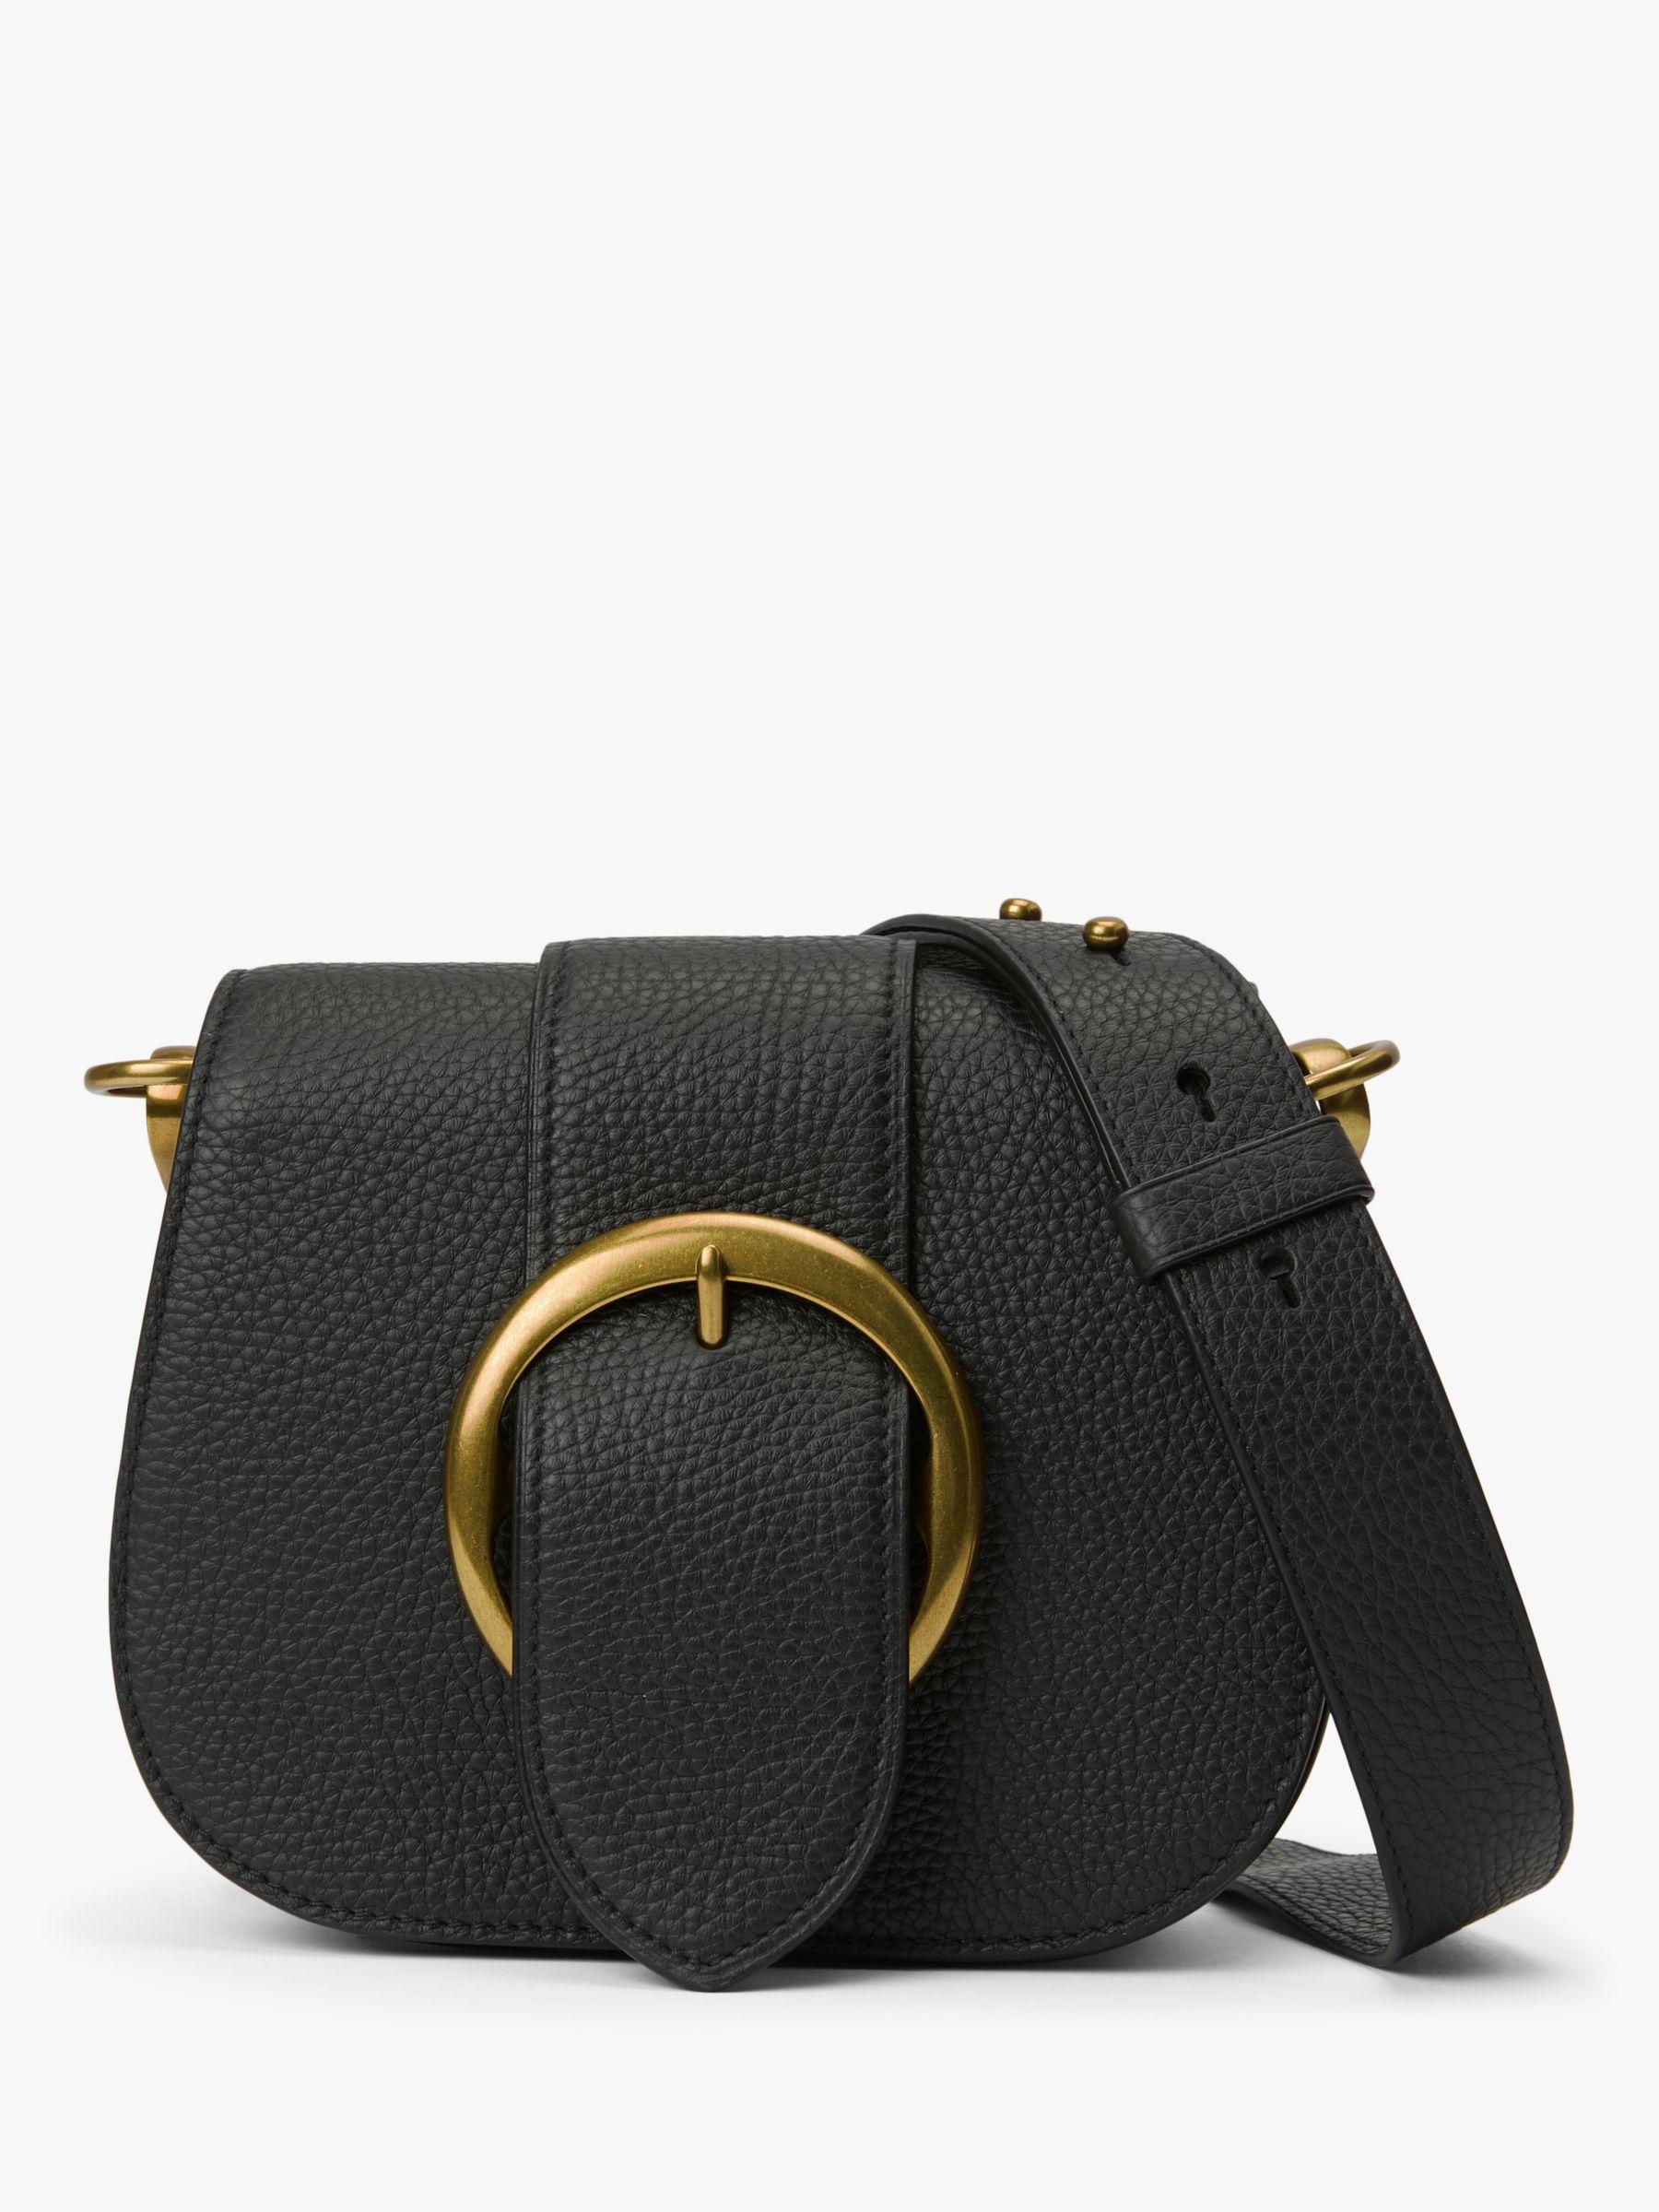 766de7f6b1 Polo Ralph Lauren Lennox Saddle Leather Cross Body Bag, Black